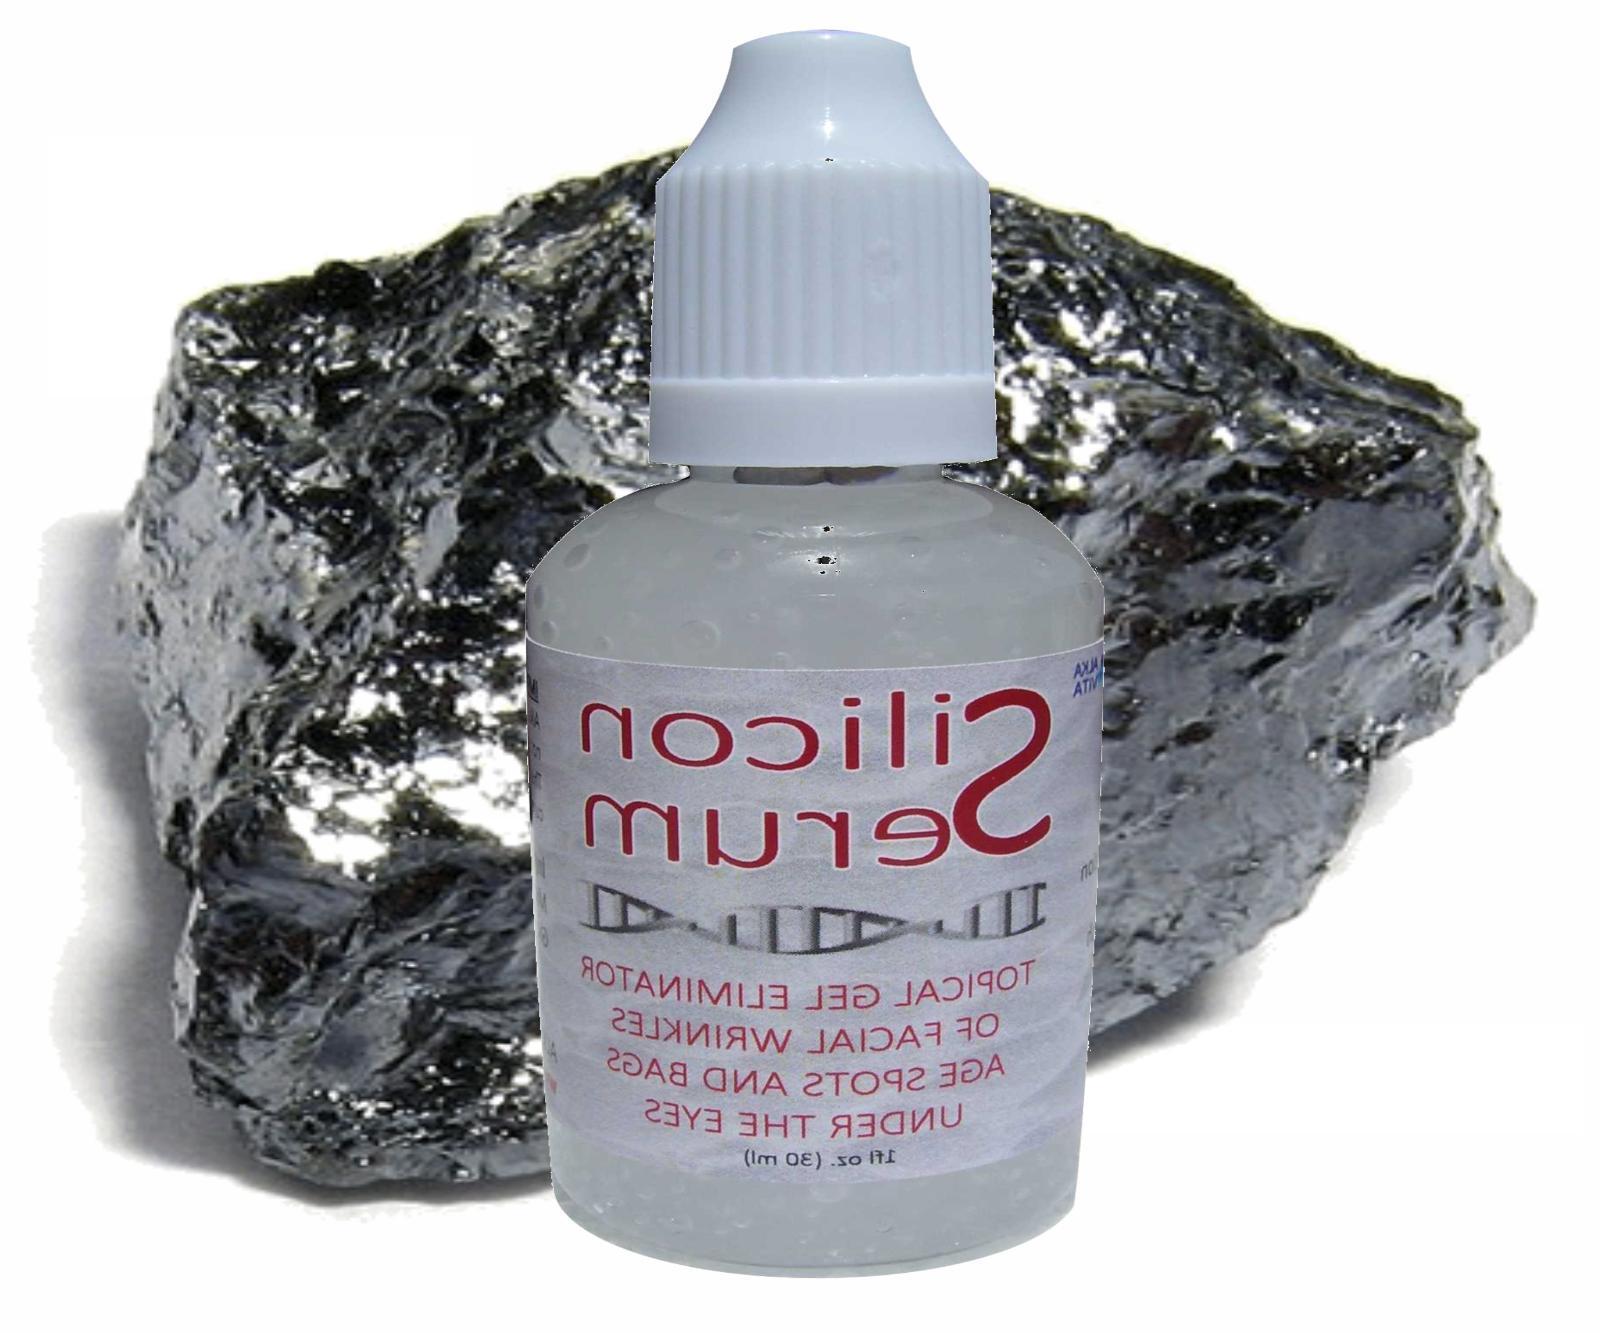 MINERAL Skin Renewal Facial Aging Lines Bags 1 oz